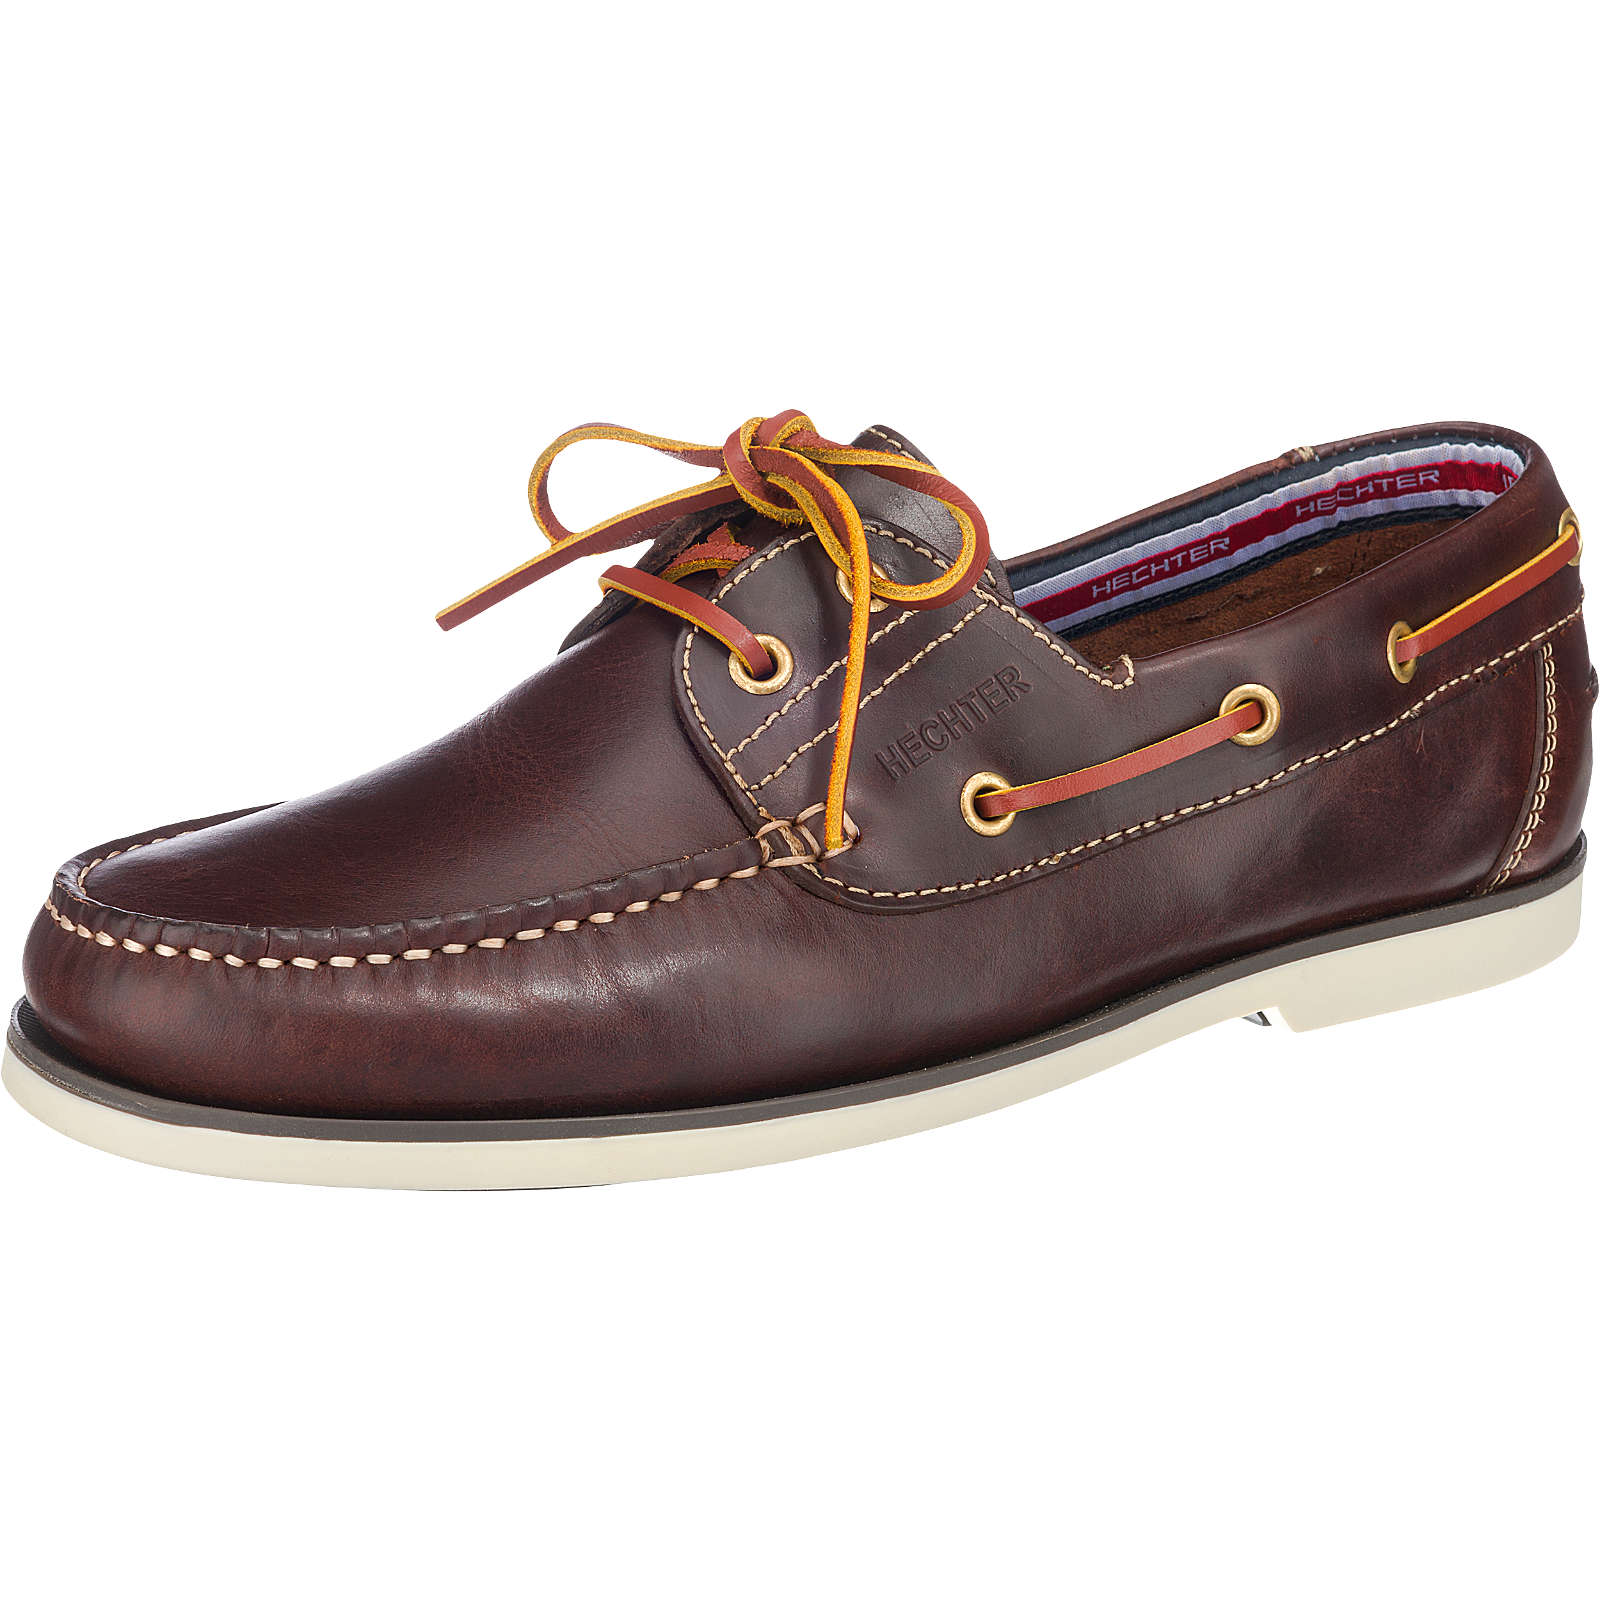 DANIEL HECHTER Freizeit Schuhe dunkelbraun Herren Gr. 44